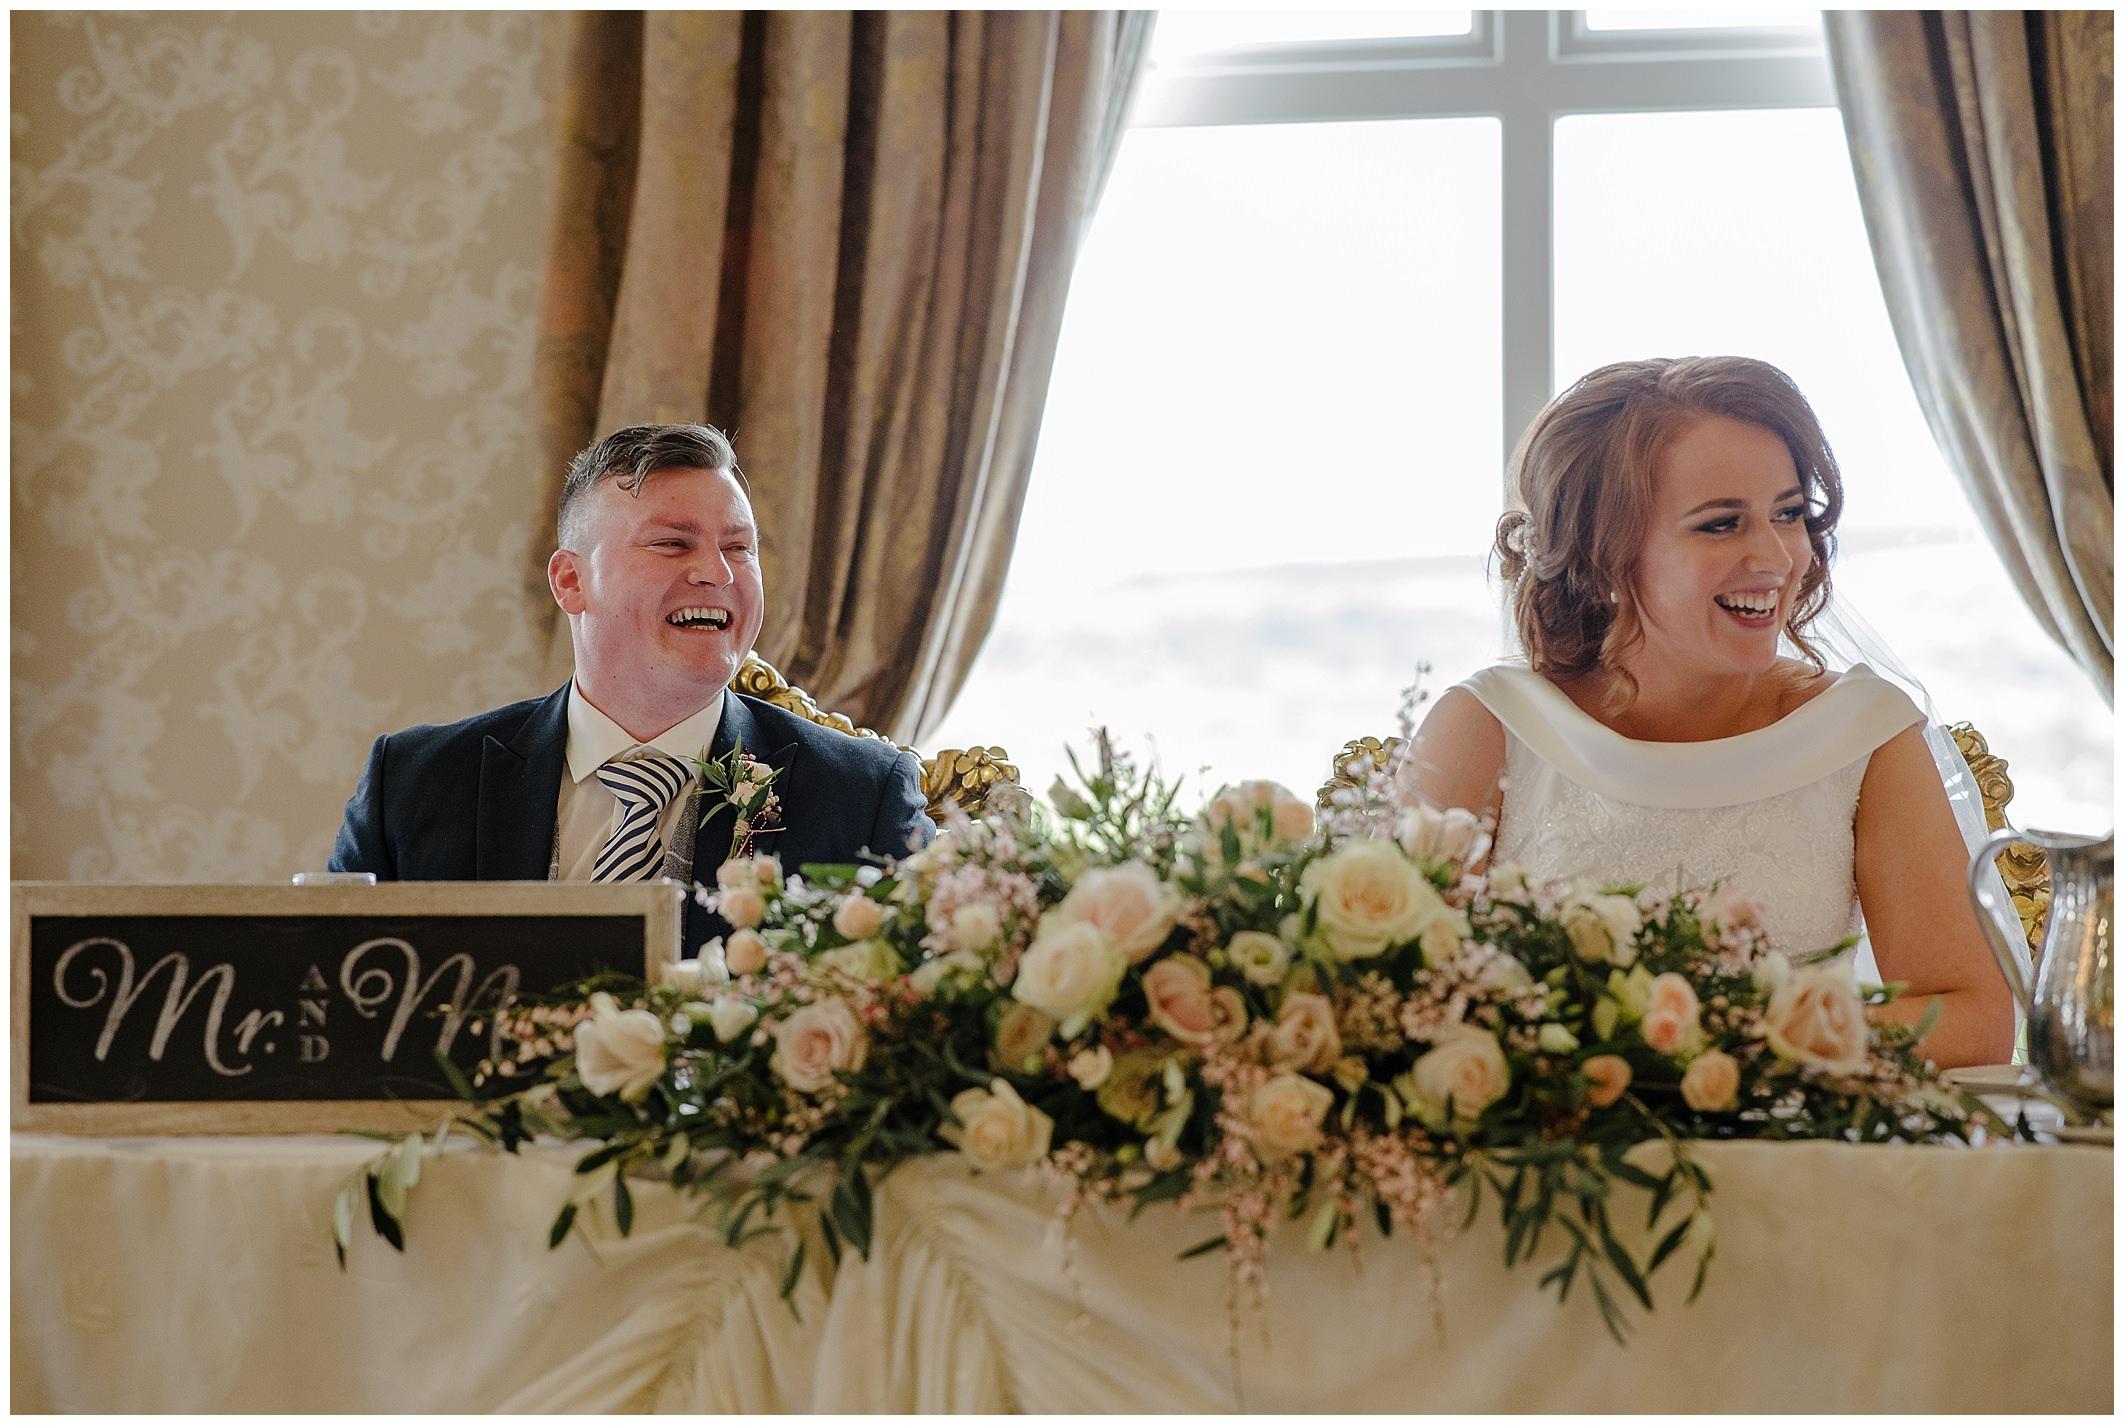 corick-house-wedding-hannah-gary-jude-browne-photography_0078.jpg